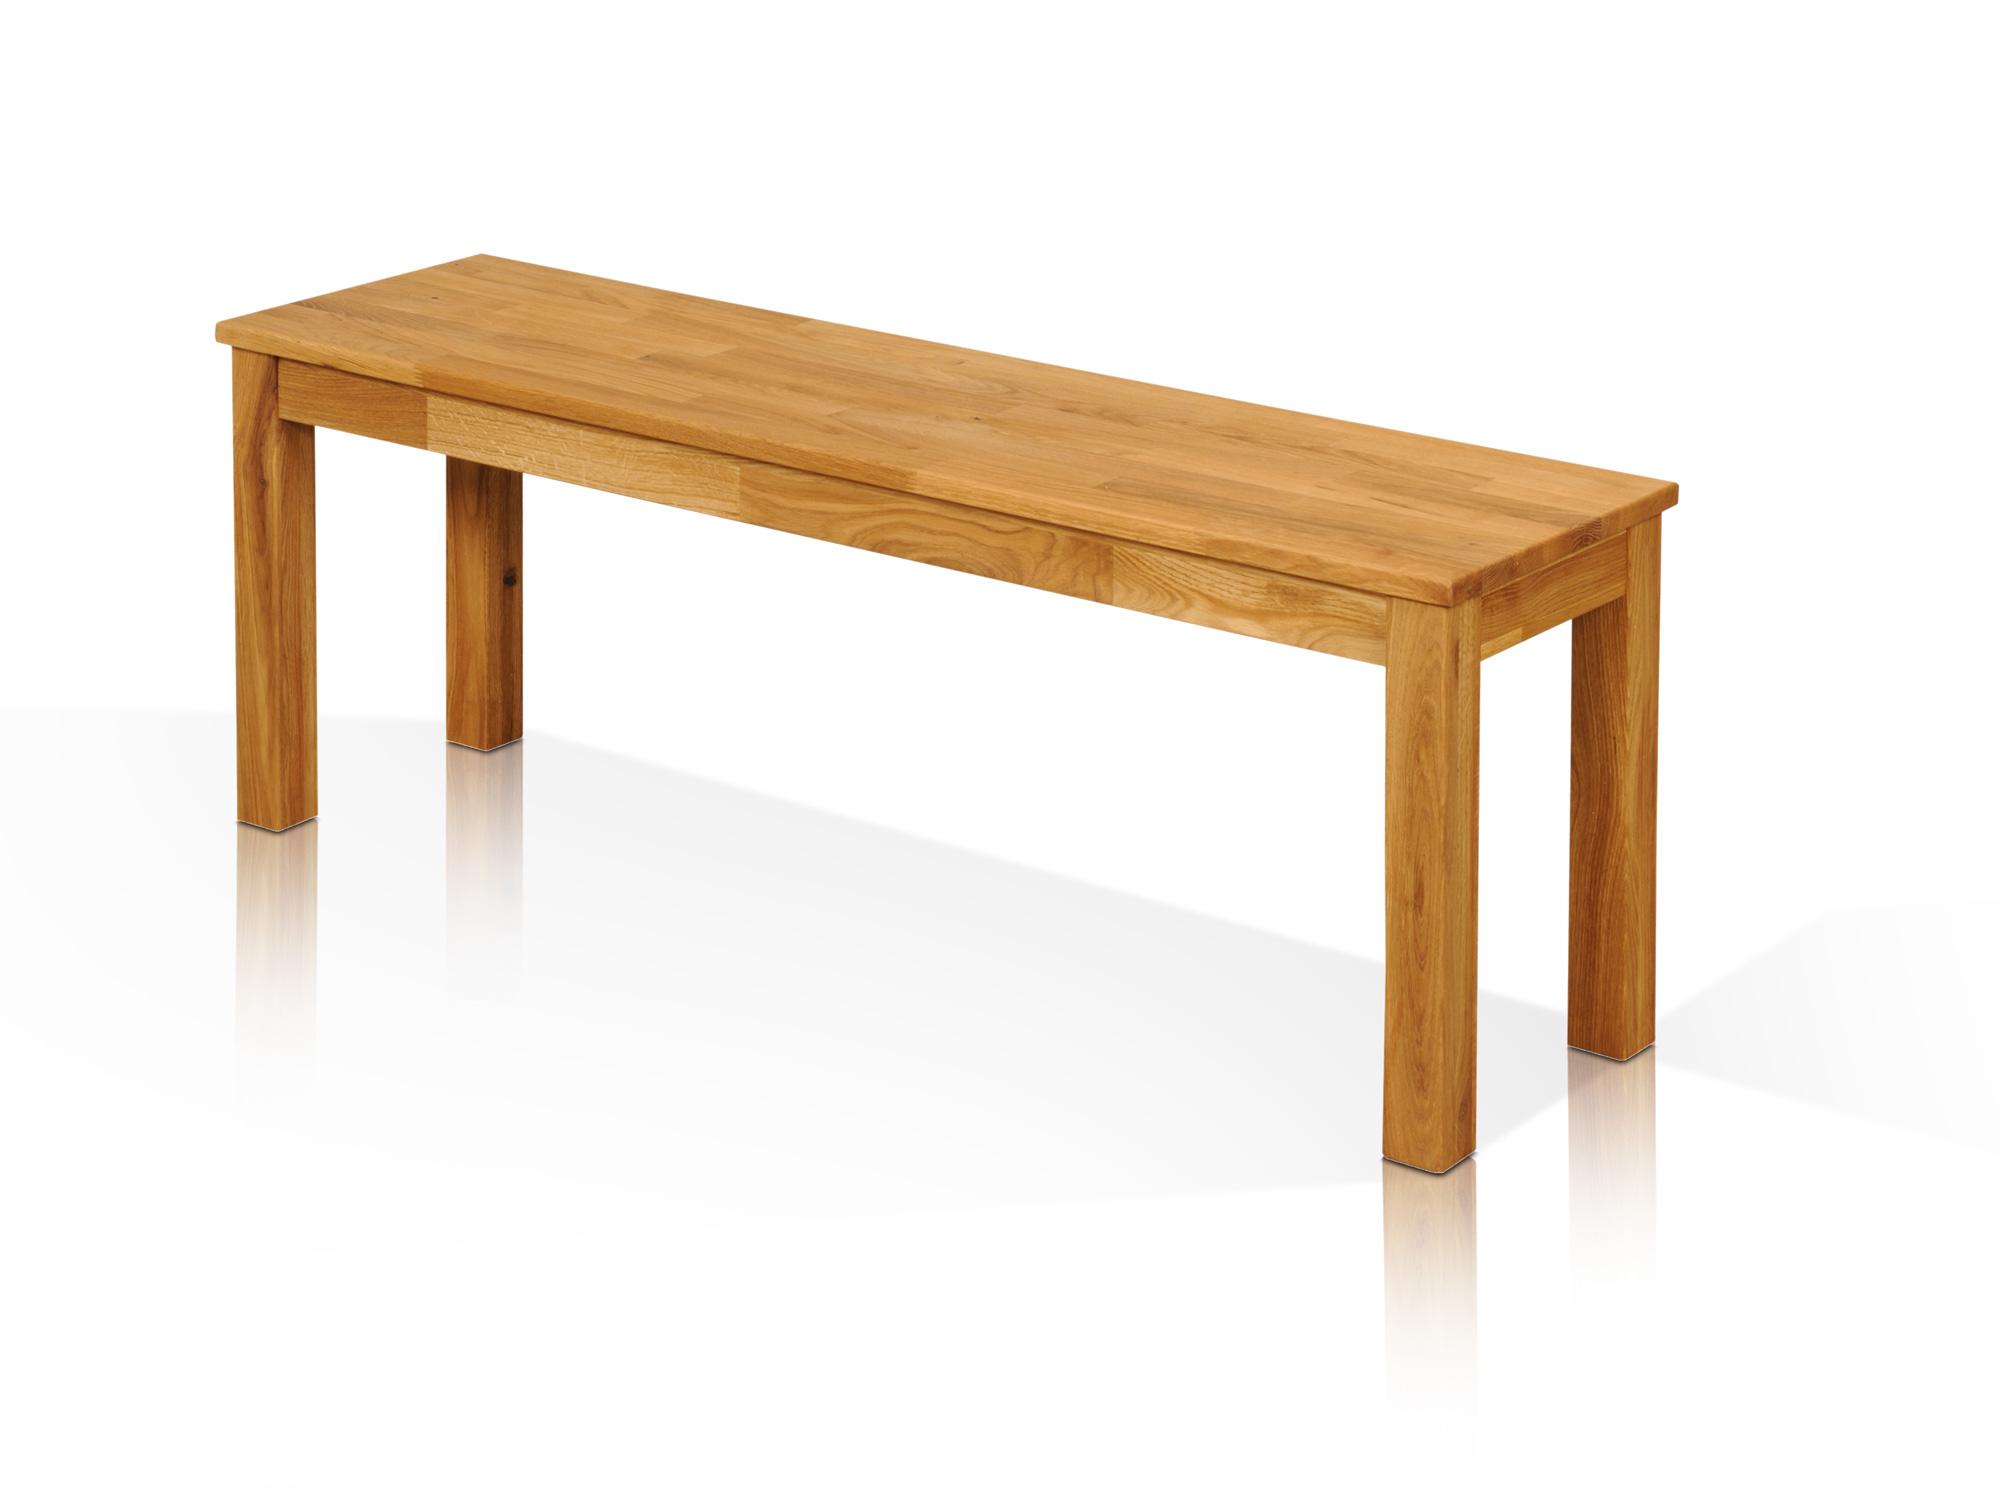 anna sitzbank wildeiche ge lt 140 cm. Black Bedroom Furniture Sets. Home Design Ideas